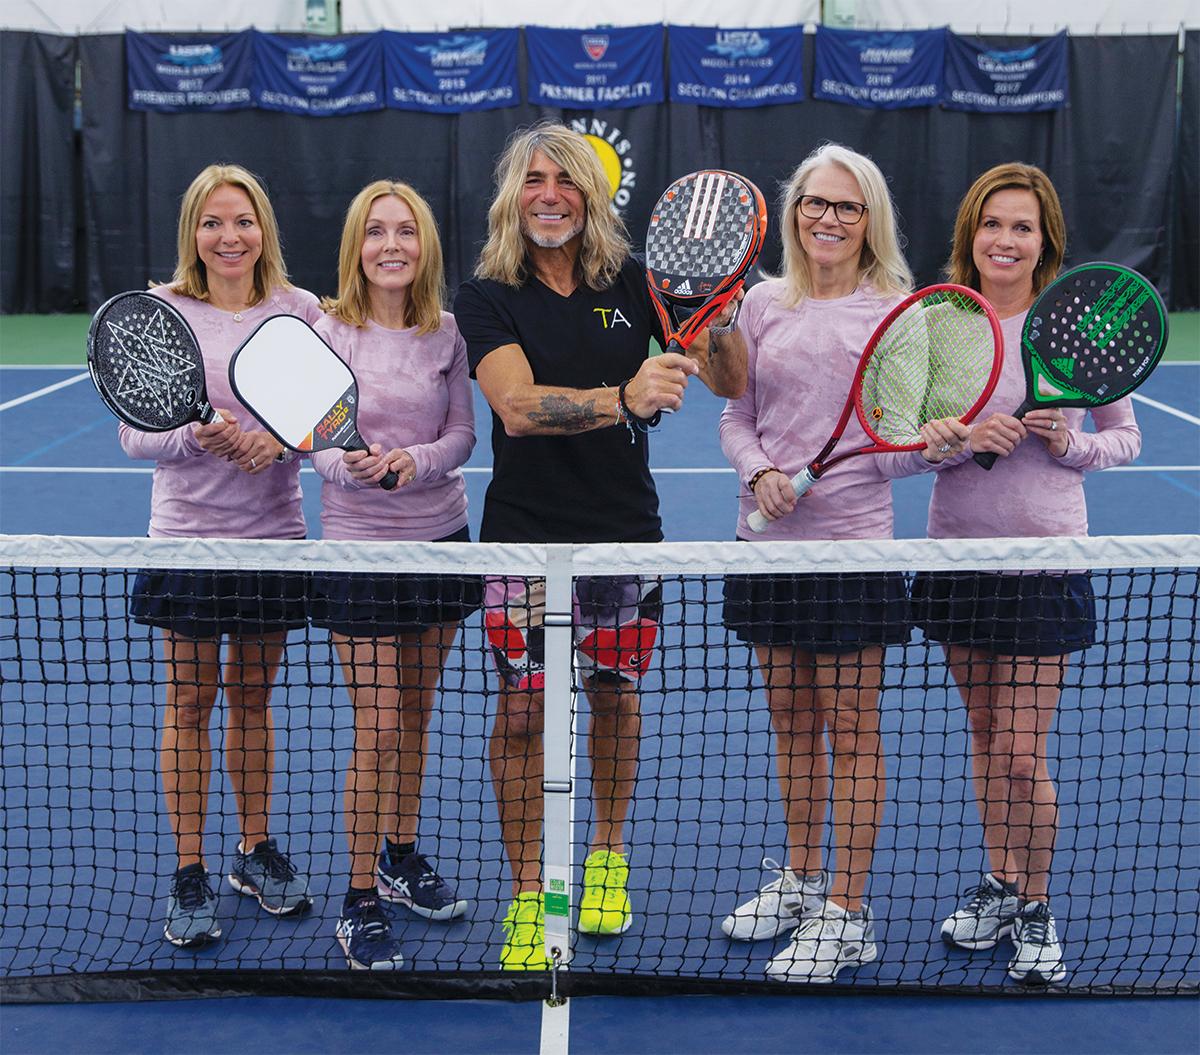 Tennis Addiction: The Future of Racquet Sports